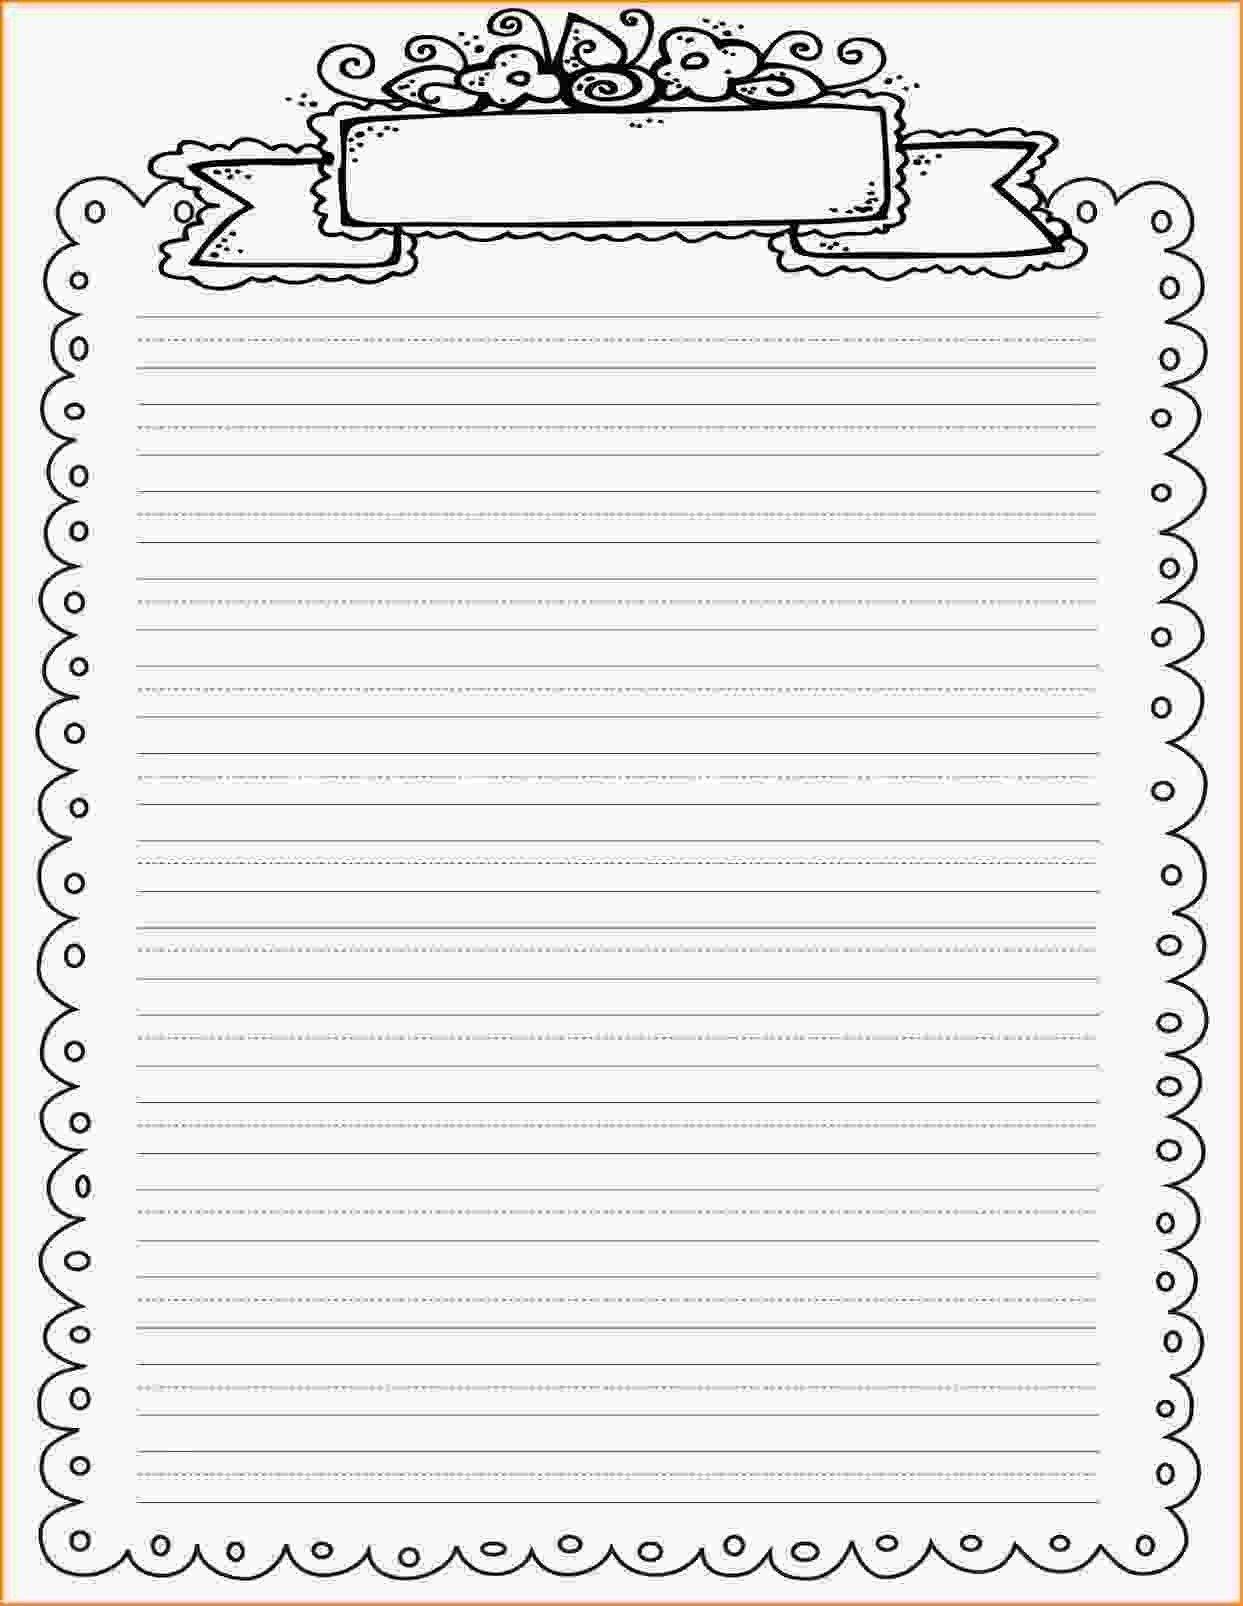 Pinmel Bratz On Art/teaching | Printable Lined Paper, Printable - Free Printable Writing Paper With Borders